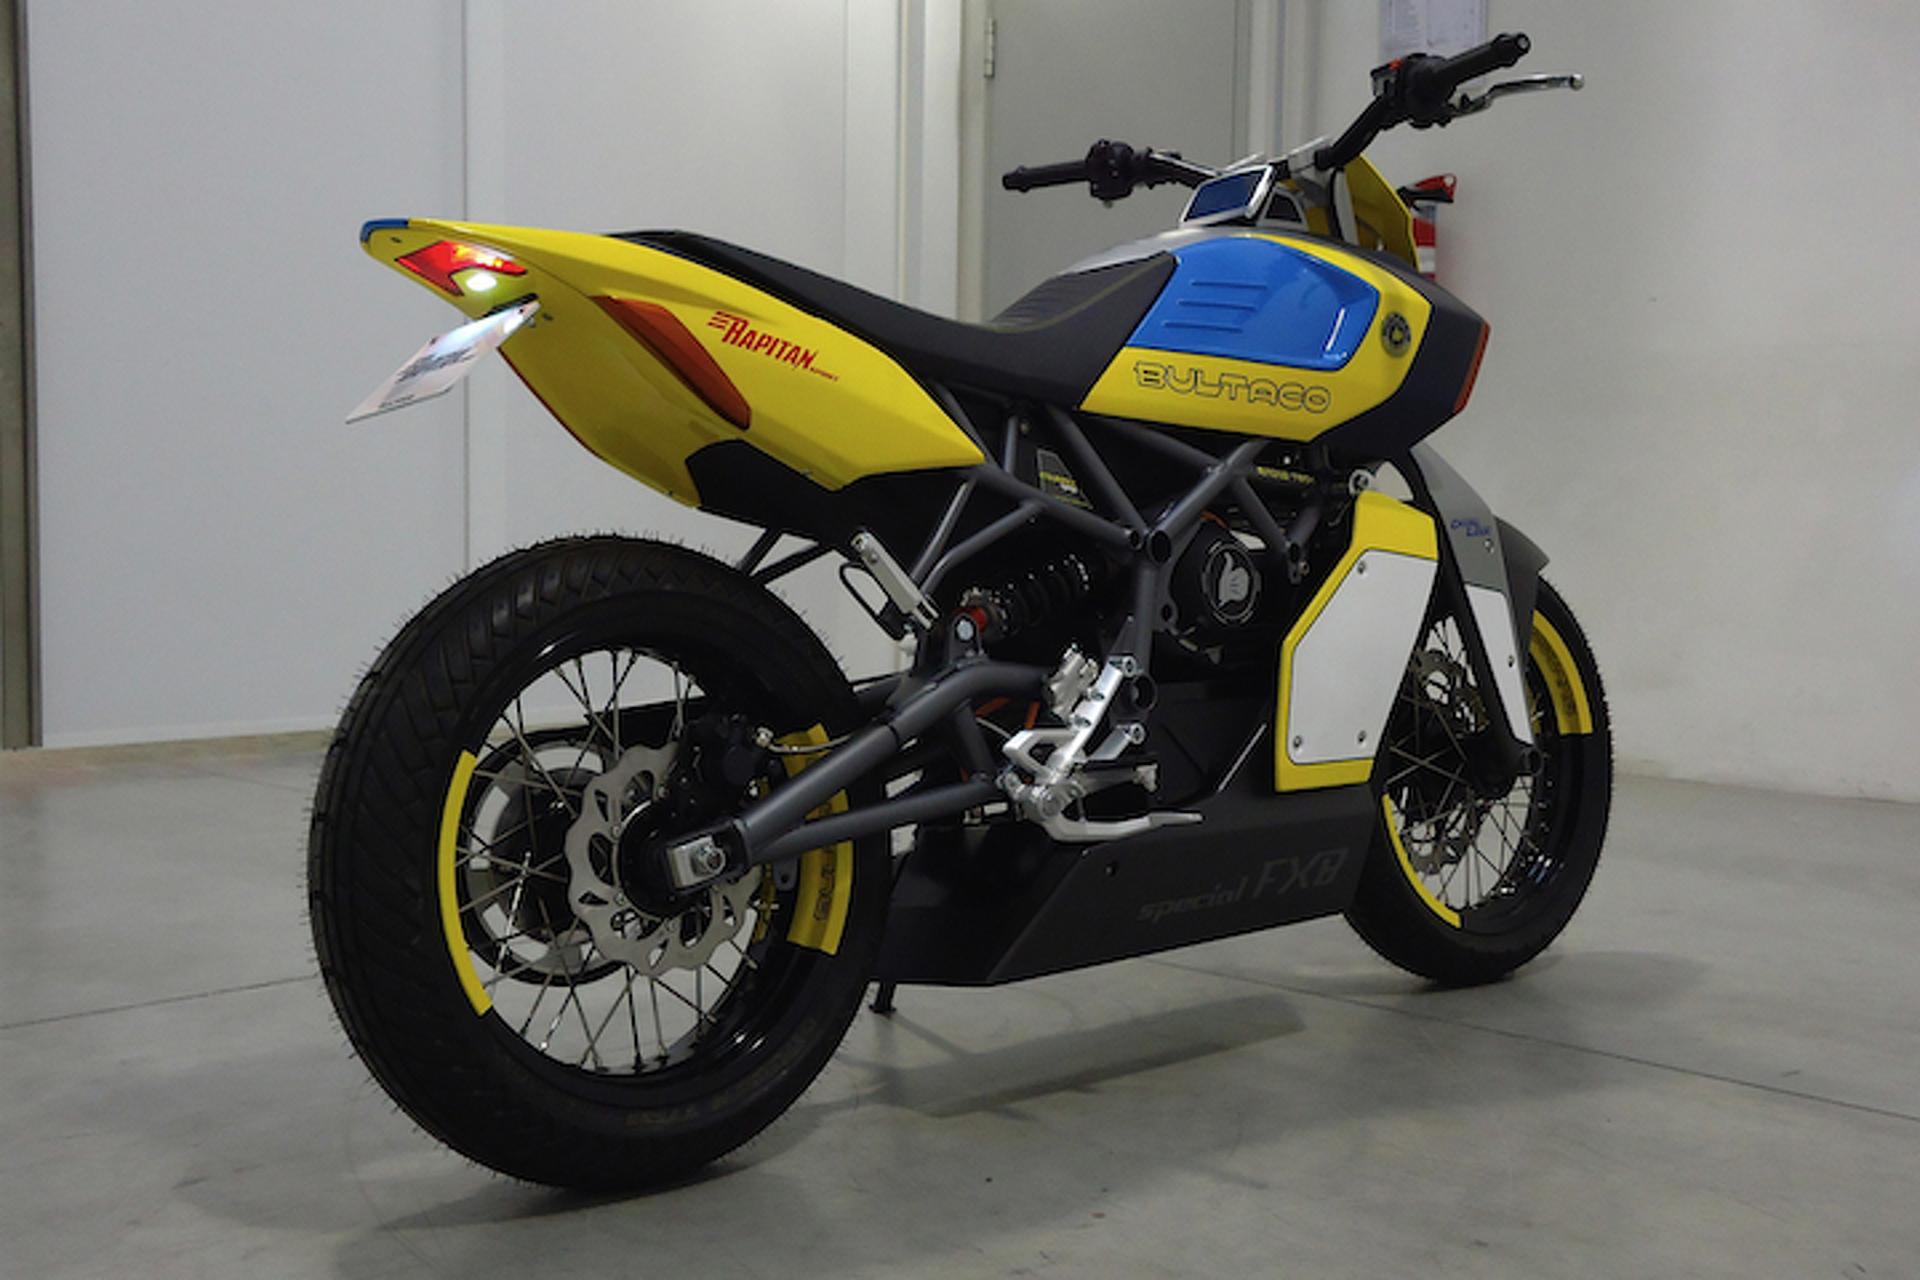 Rapitan E-Motorcycle Marks Bultaco's Return to the Bike Business